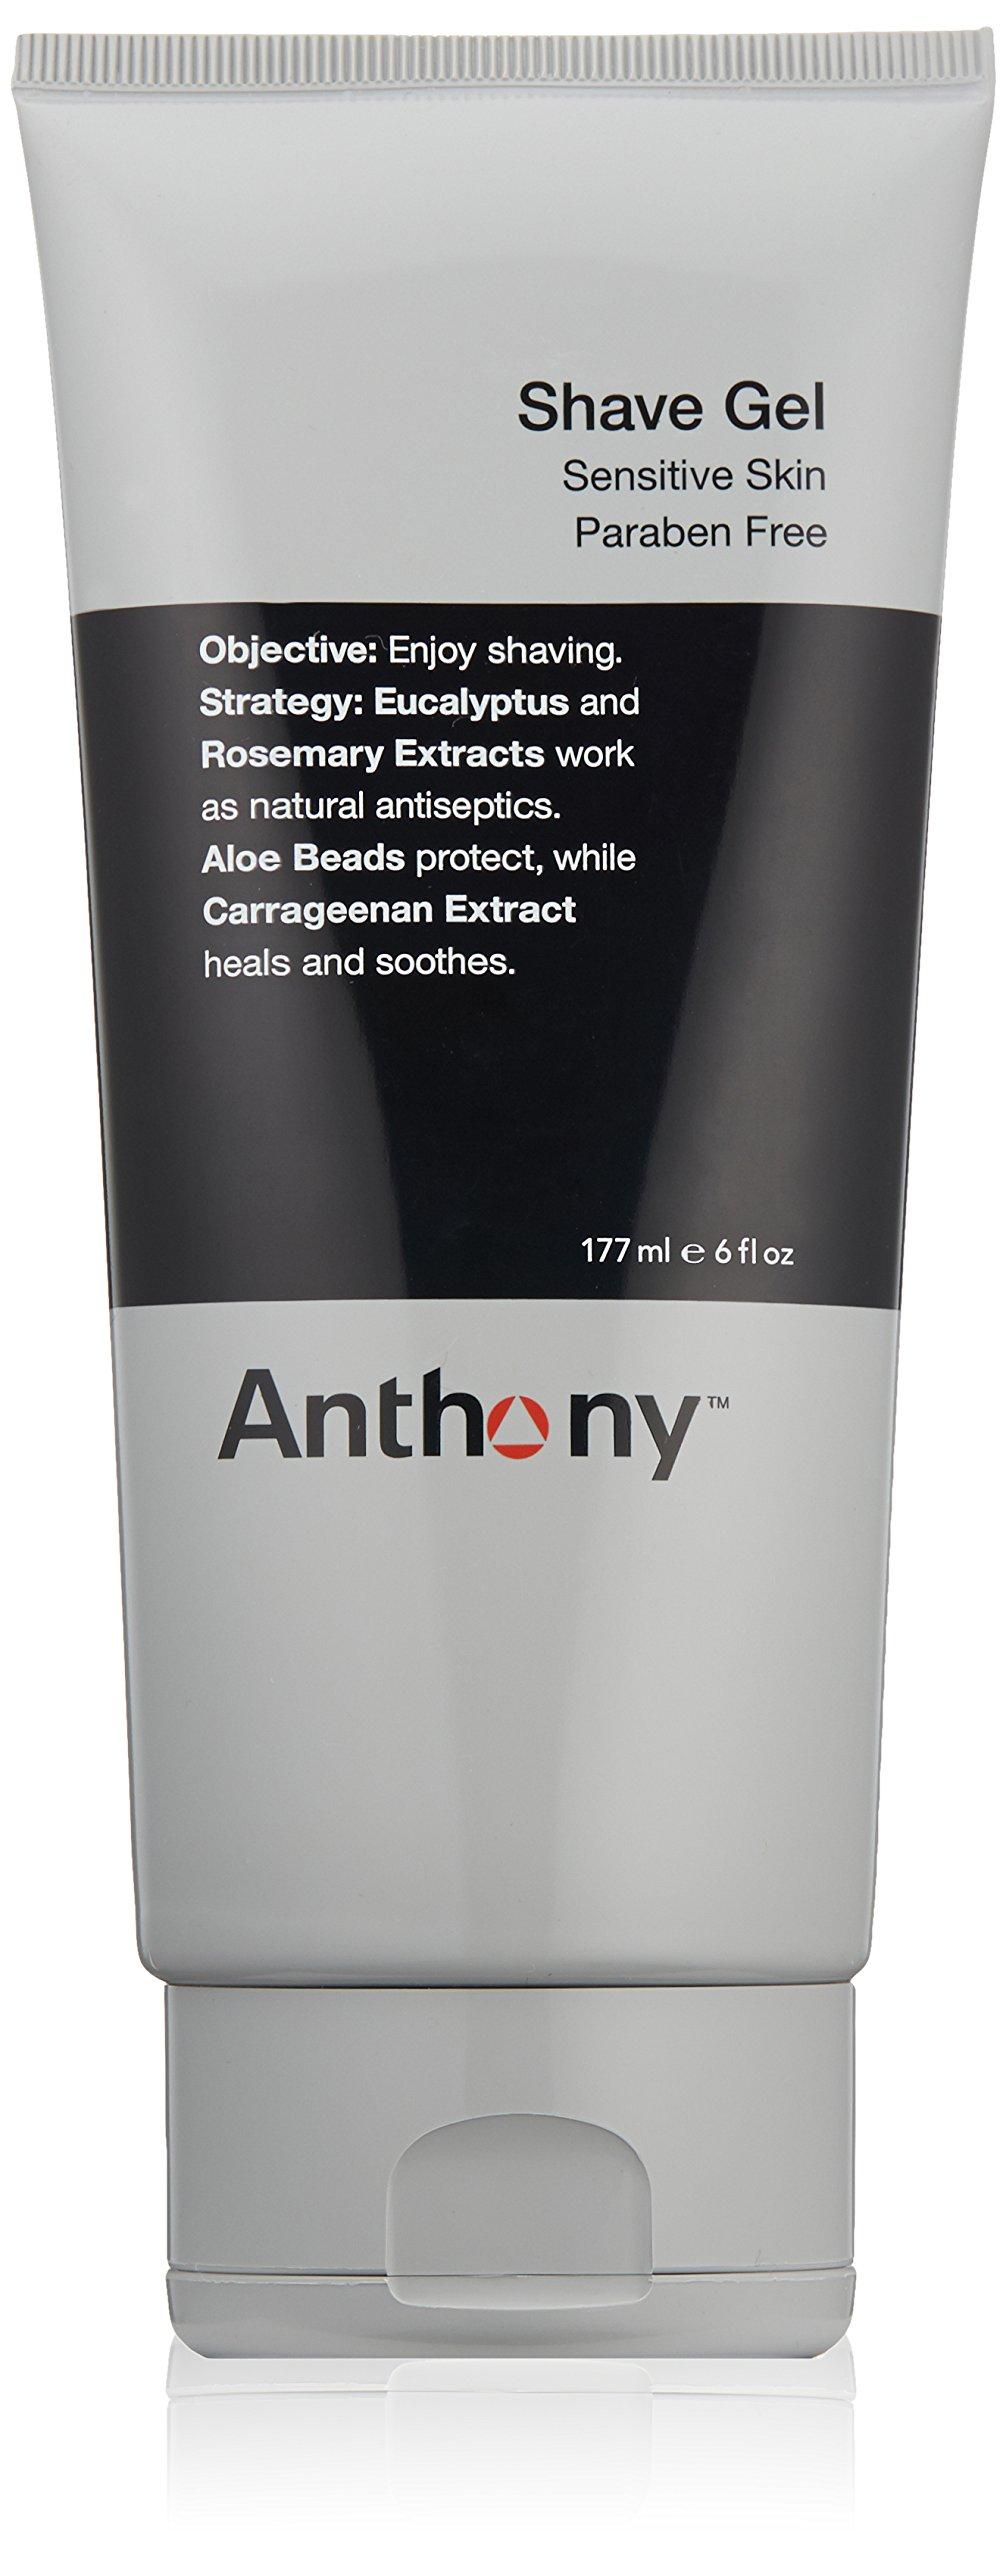 Anthony Shave Gel, 6 fl. oz.